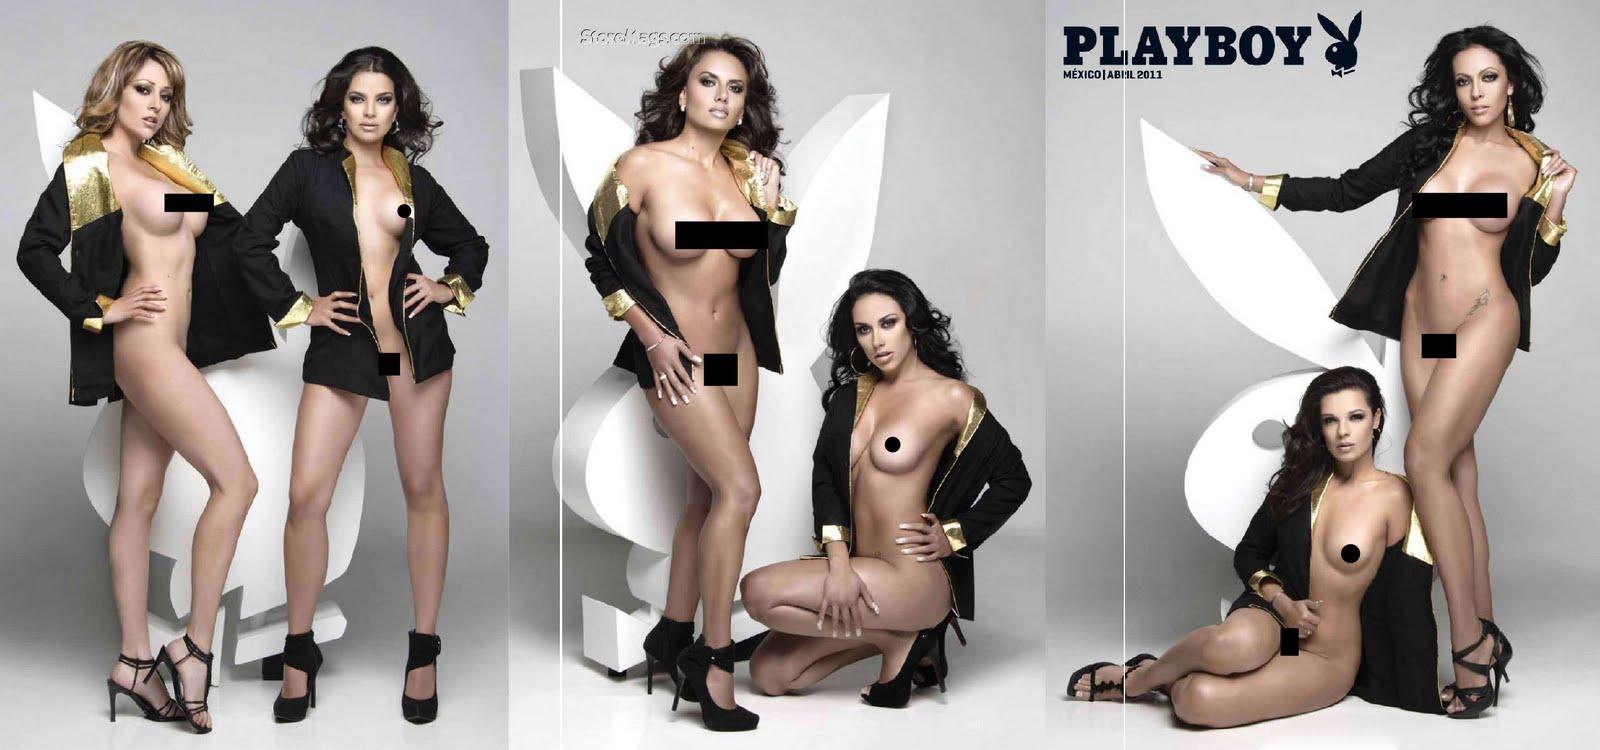 aeromozas nude stewardesses on playboy cover in 2011